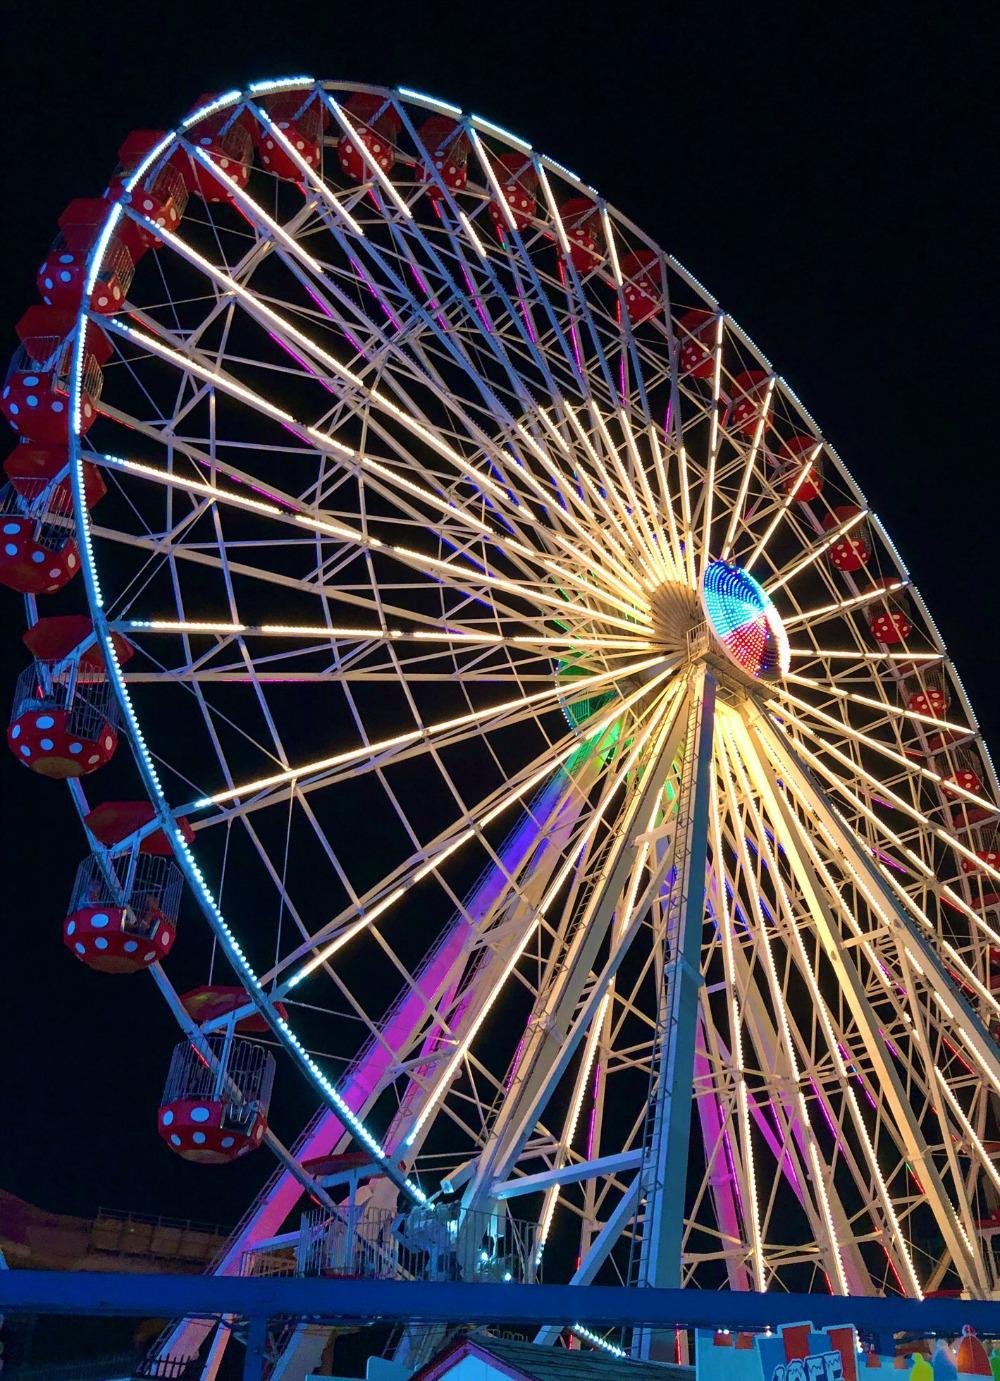 Jersey Shore Photo Diary I Ocean City Boardwalk Ferris wheel #Travel #TravelBlogger #TravelPhotography